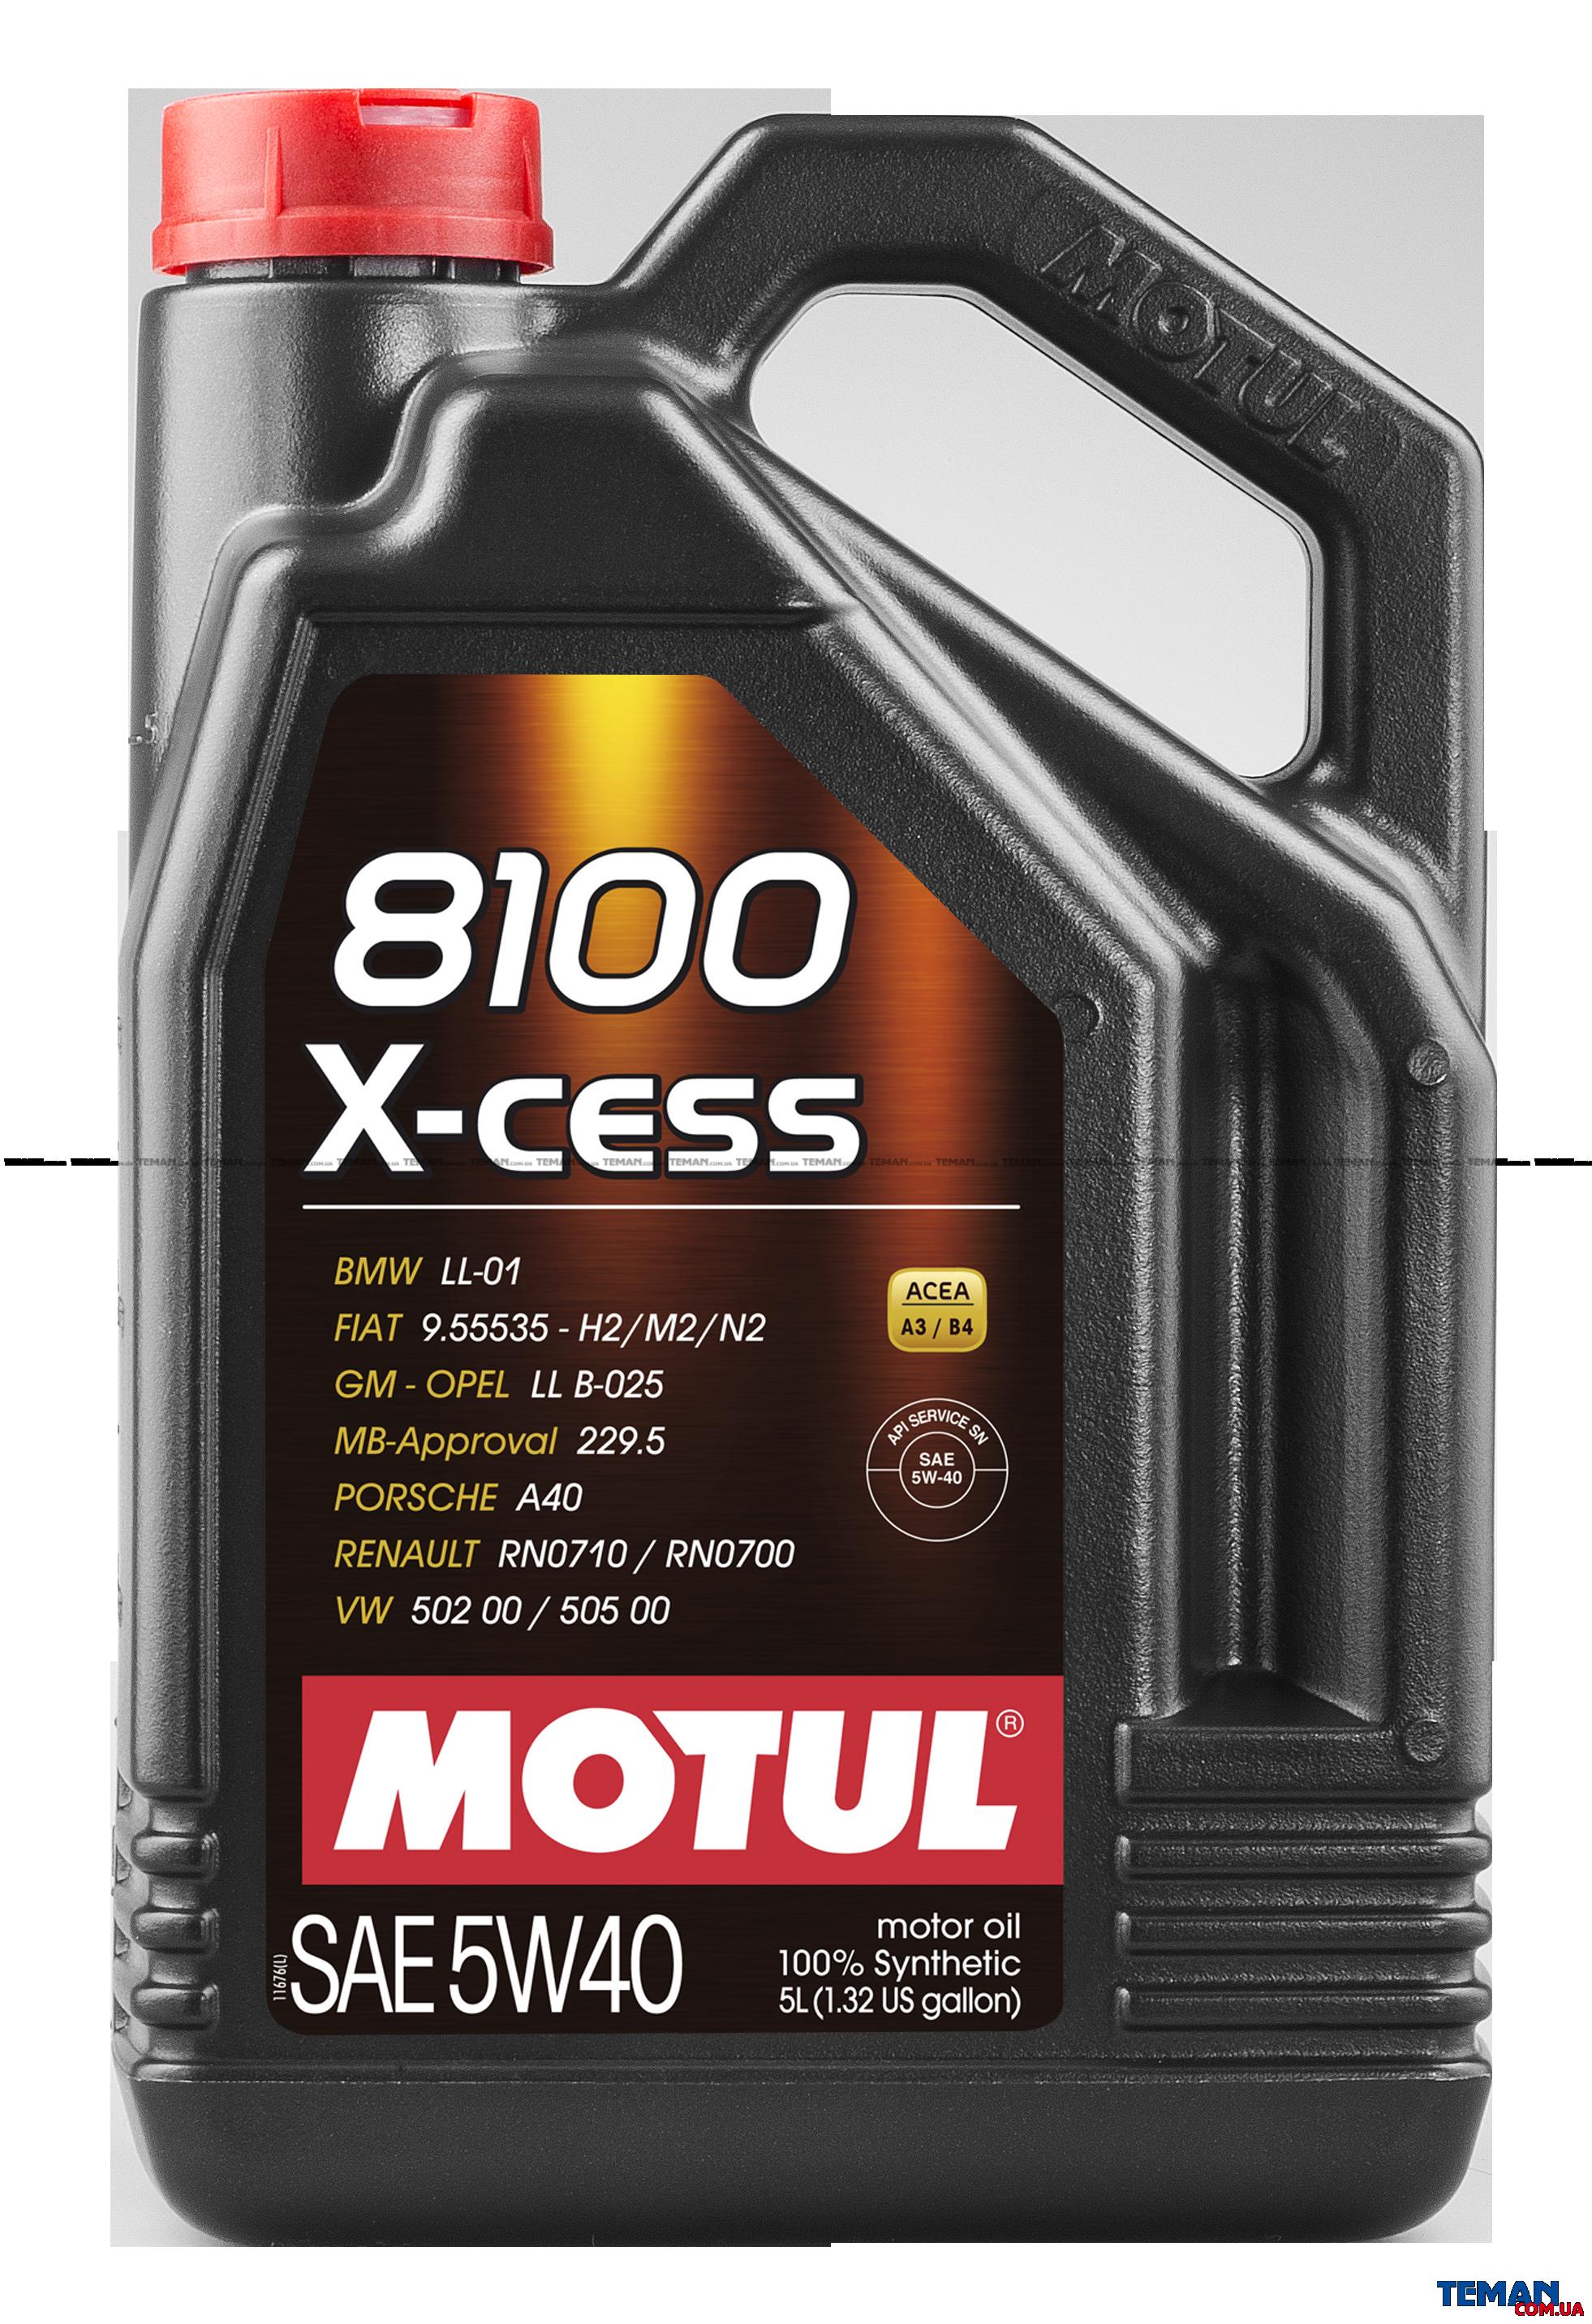 Синтетическое моторное масло 8100 X-cess SAE 5W40, 5 л